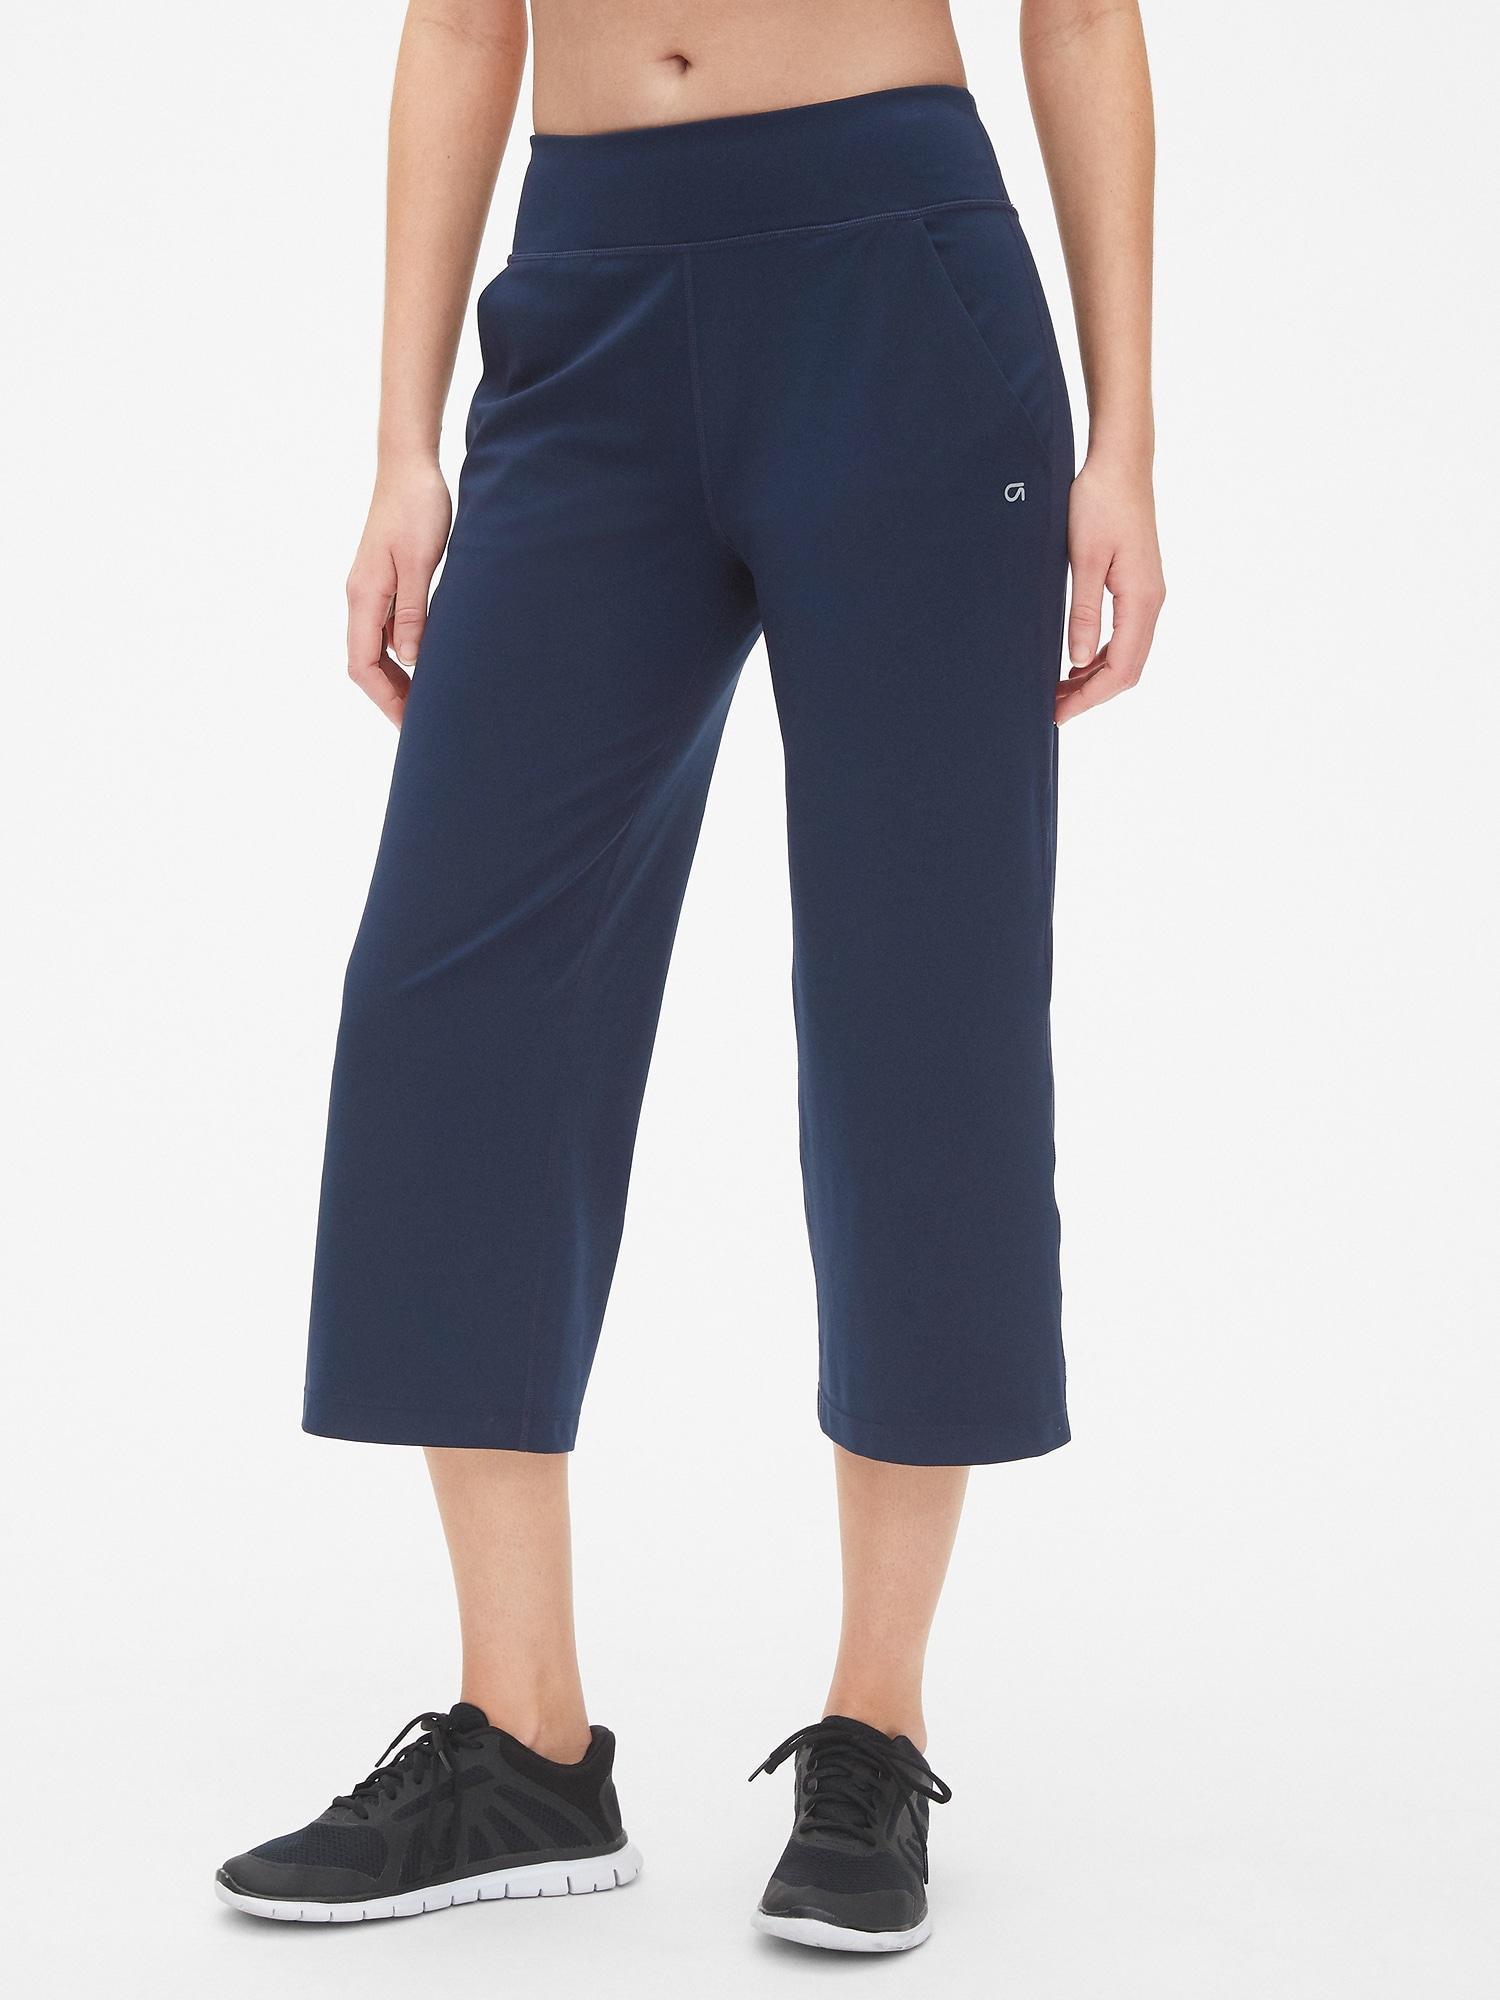 03af06d996 Lyst - Gap Fit Studio Wide-leg Crop Pants In Eclipse in Blue